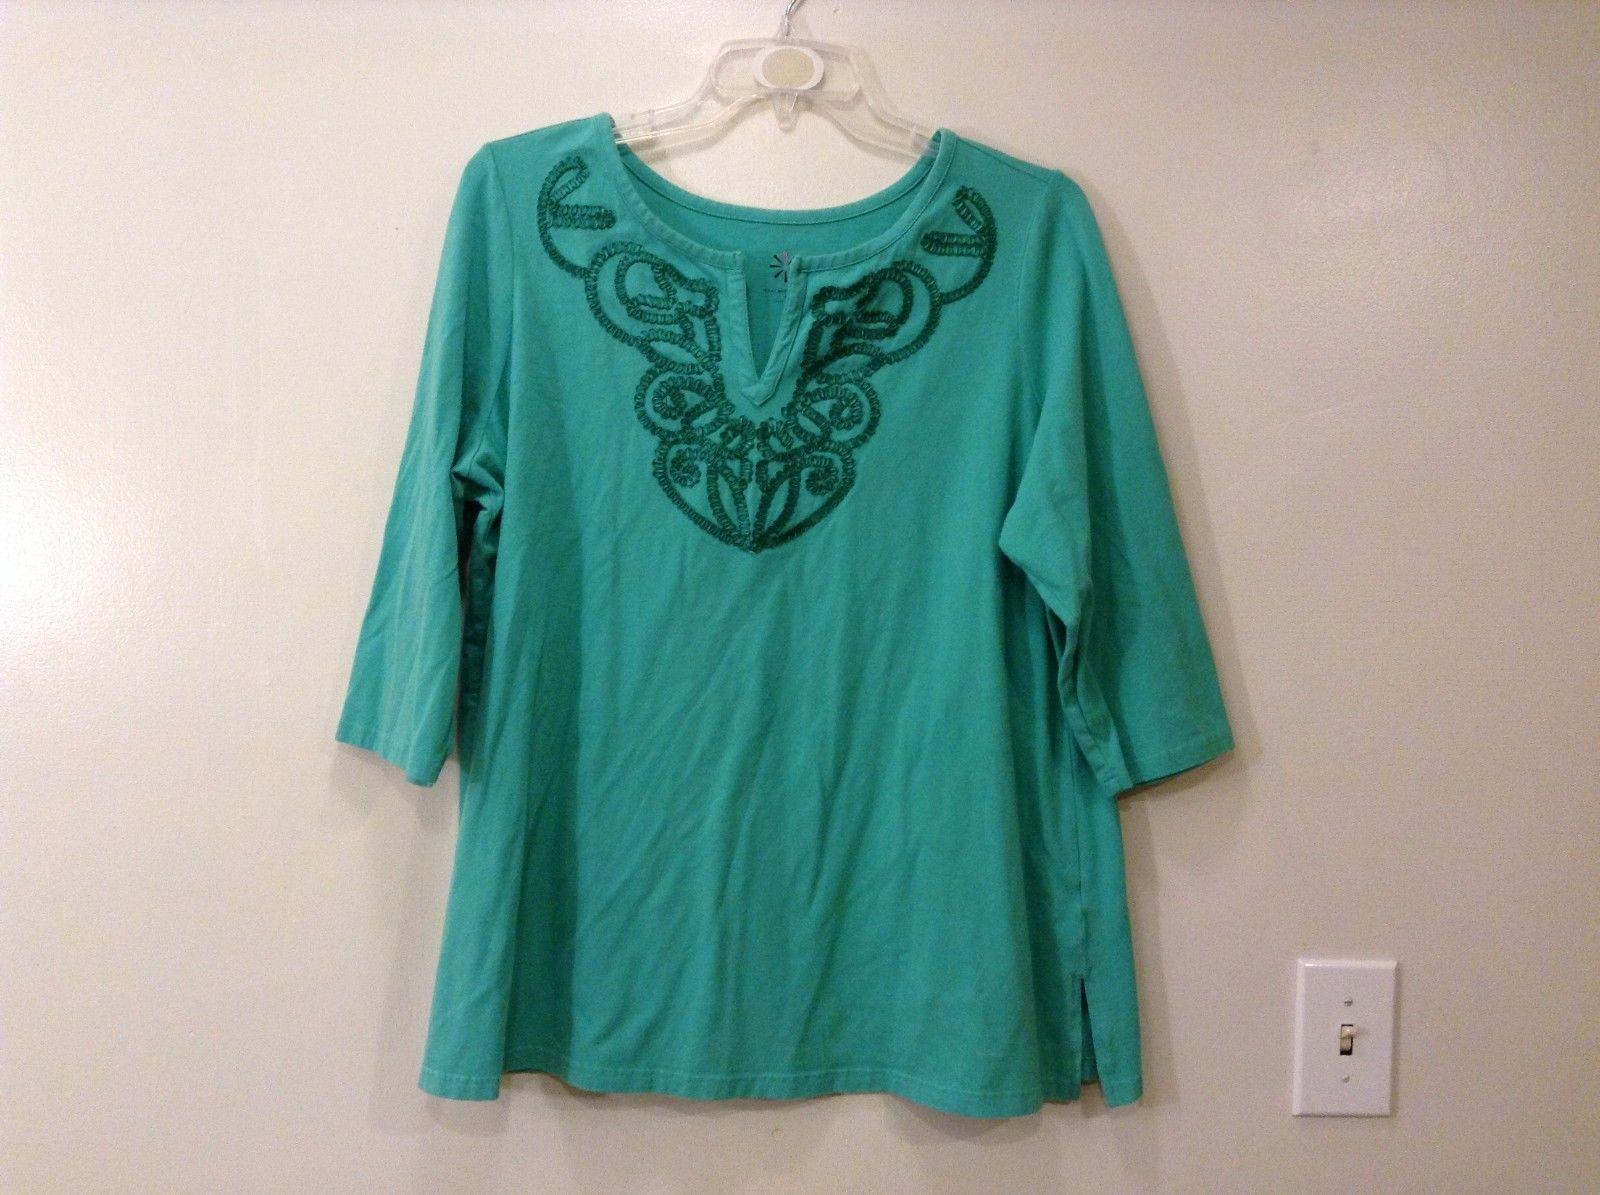 Isaac Mizrahi Live Light Green V-Neck Embroidery T-Shirt Blouse Size 1X